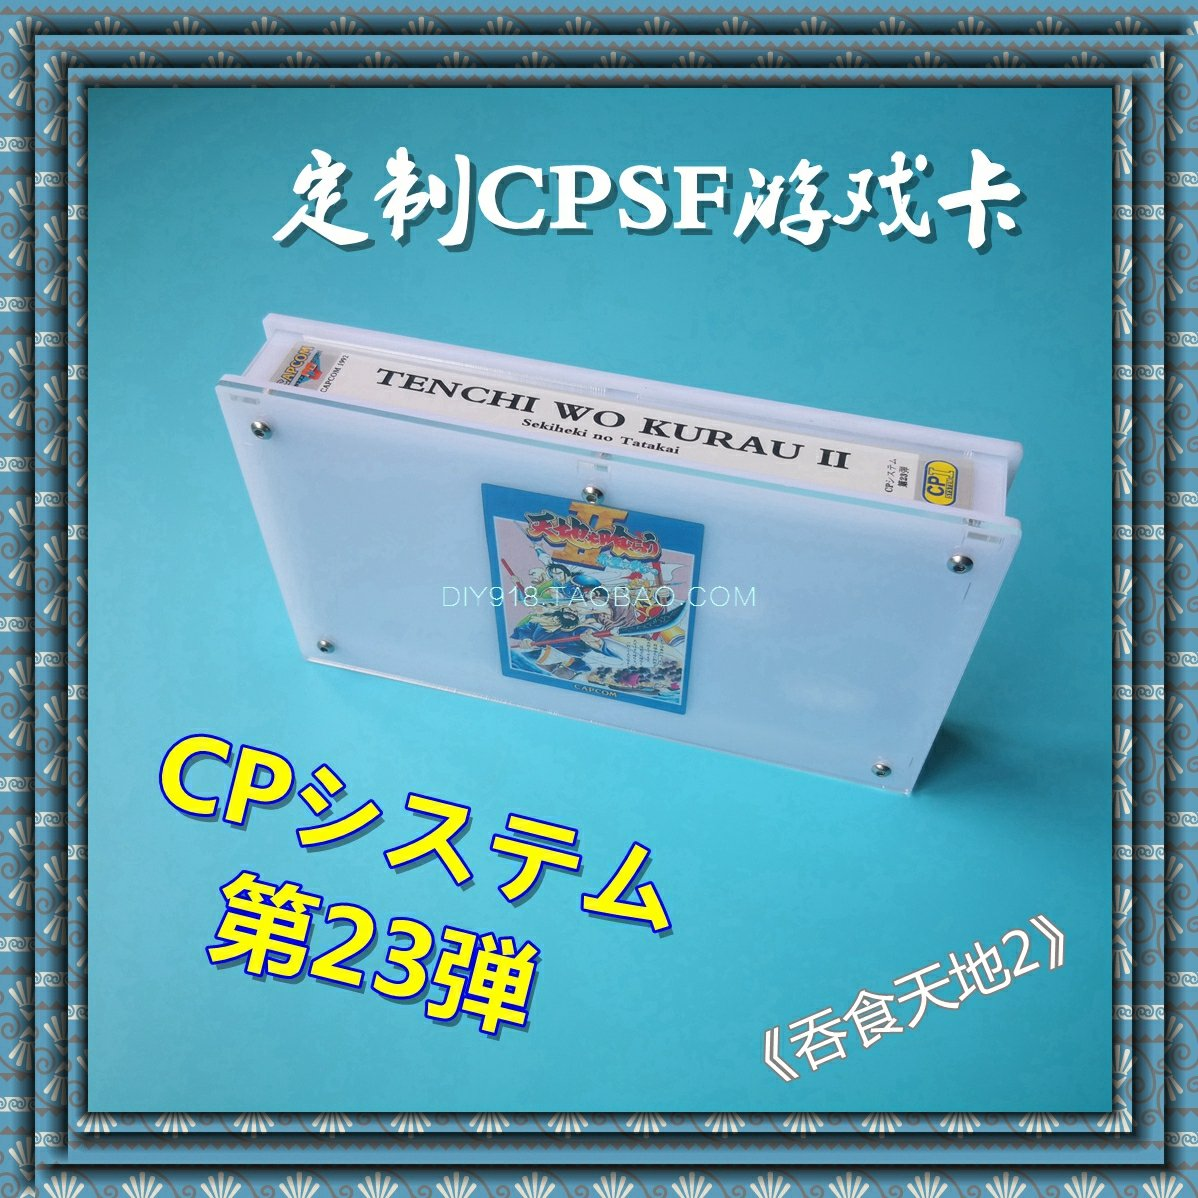 117B3739-E664-4FC5-87D1-32386F4BABC7.jpeg